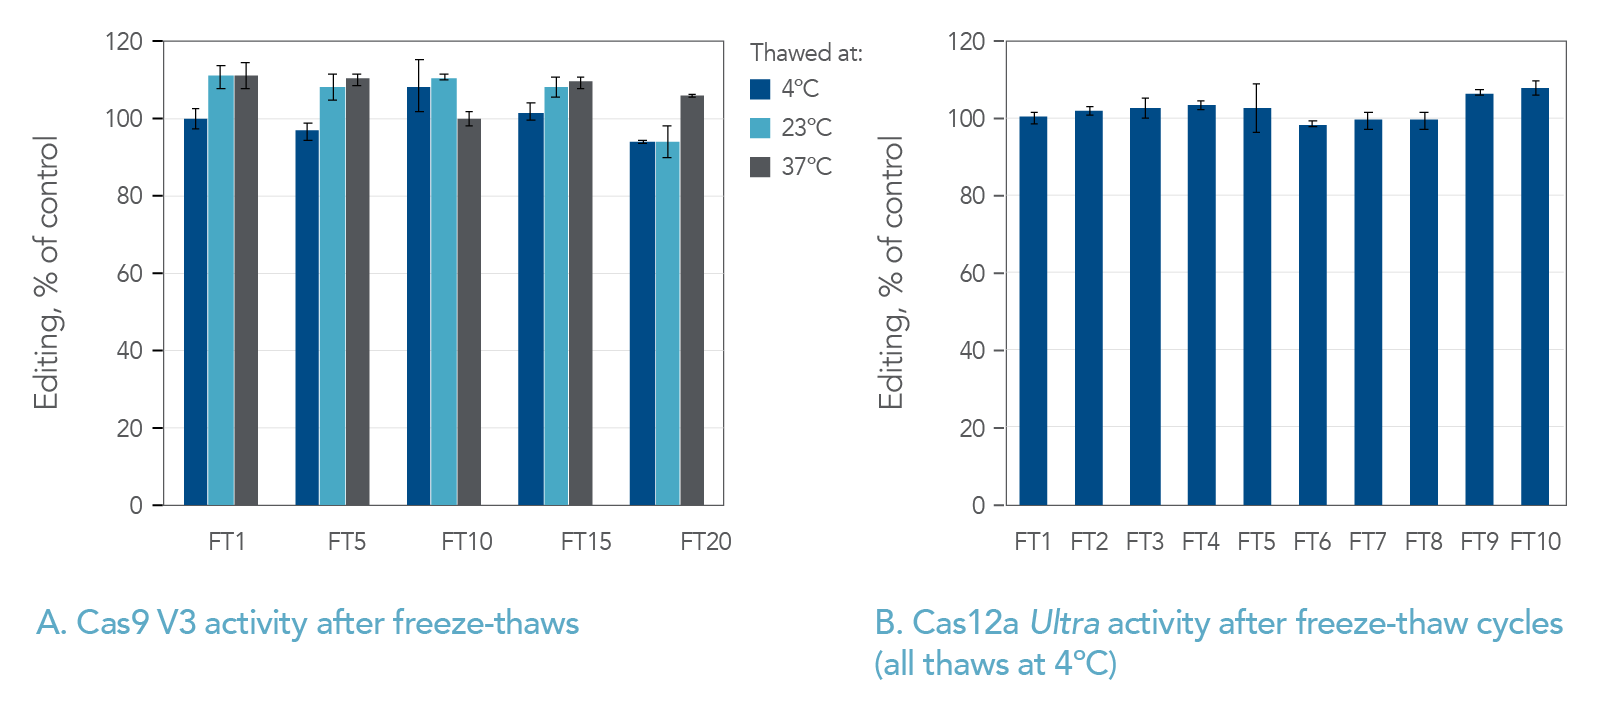 Cas activity after freeze-thaws